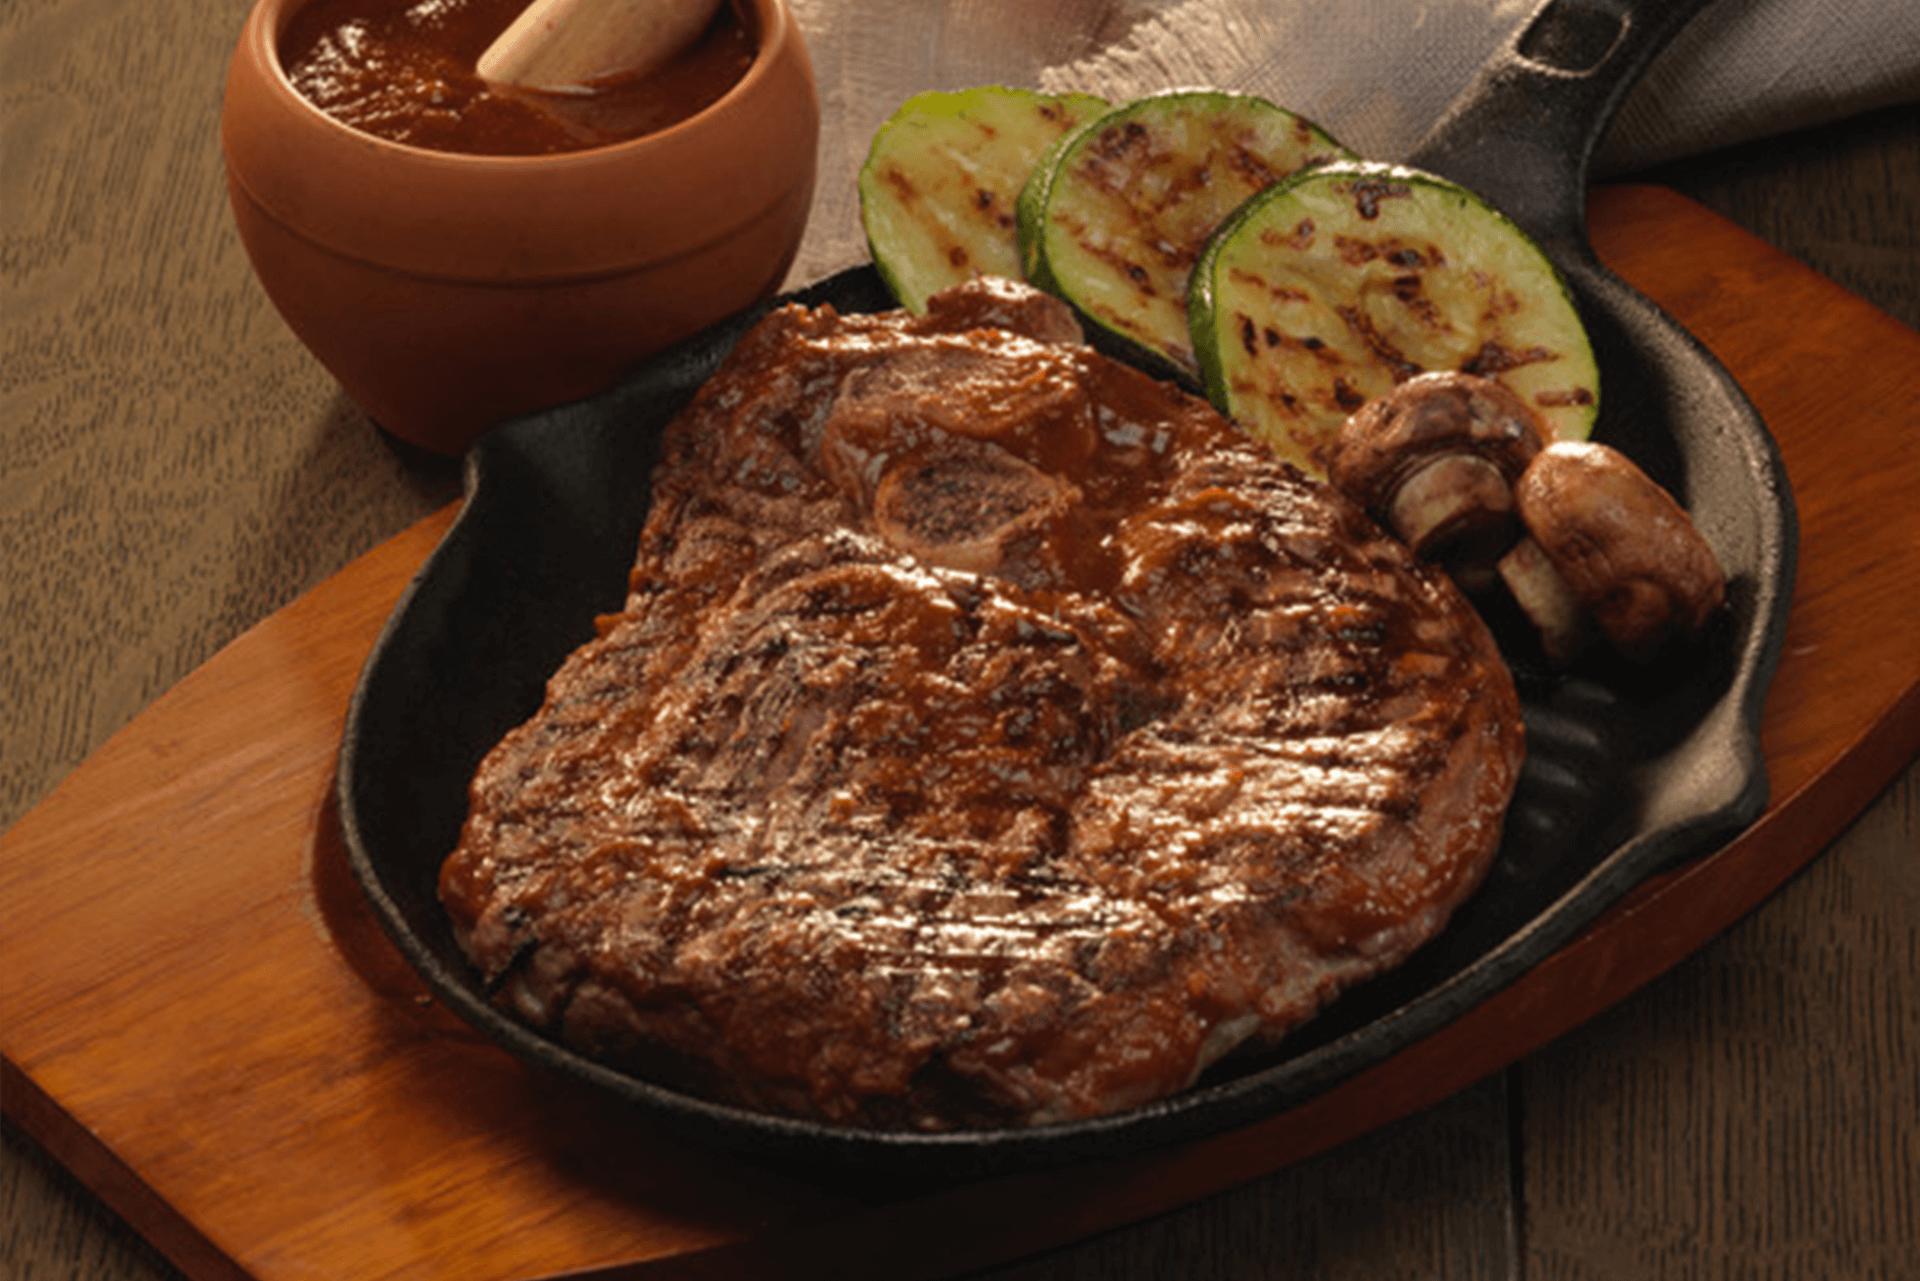 SunGold Western BBQ Sauce for Lamb Steak